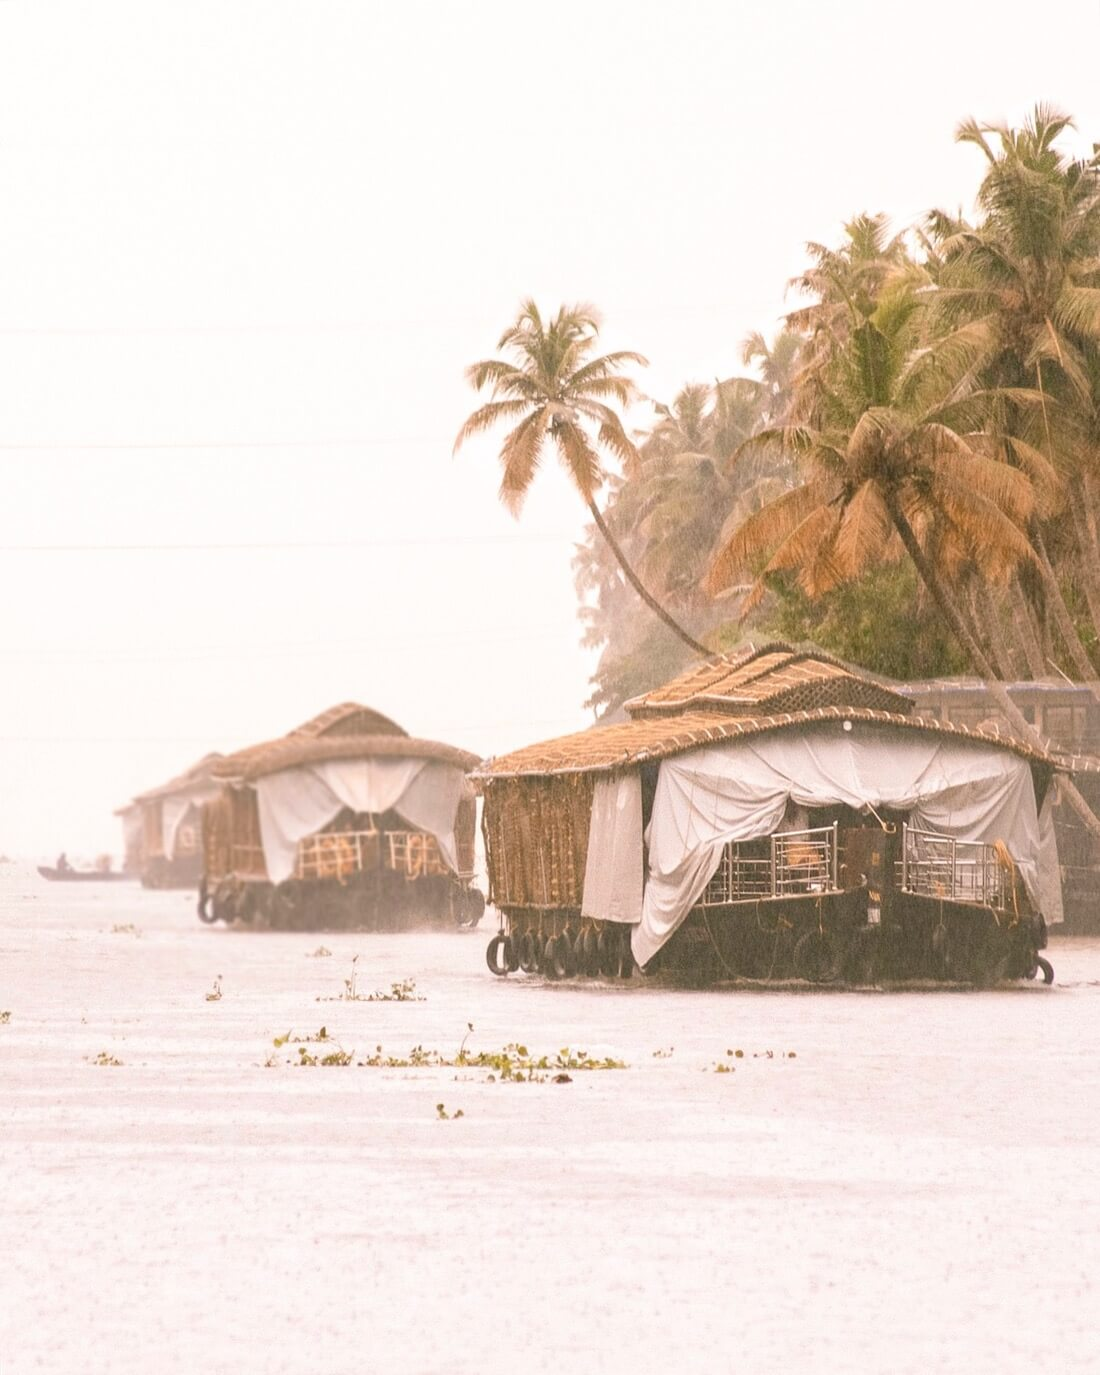 3 Allepey Houseboats cruising down the lake alongside Palm Trees